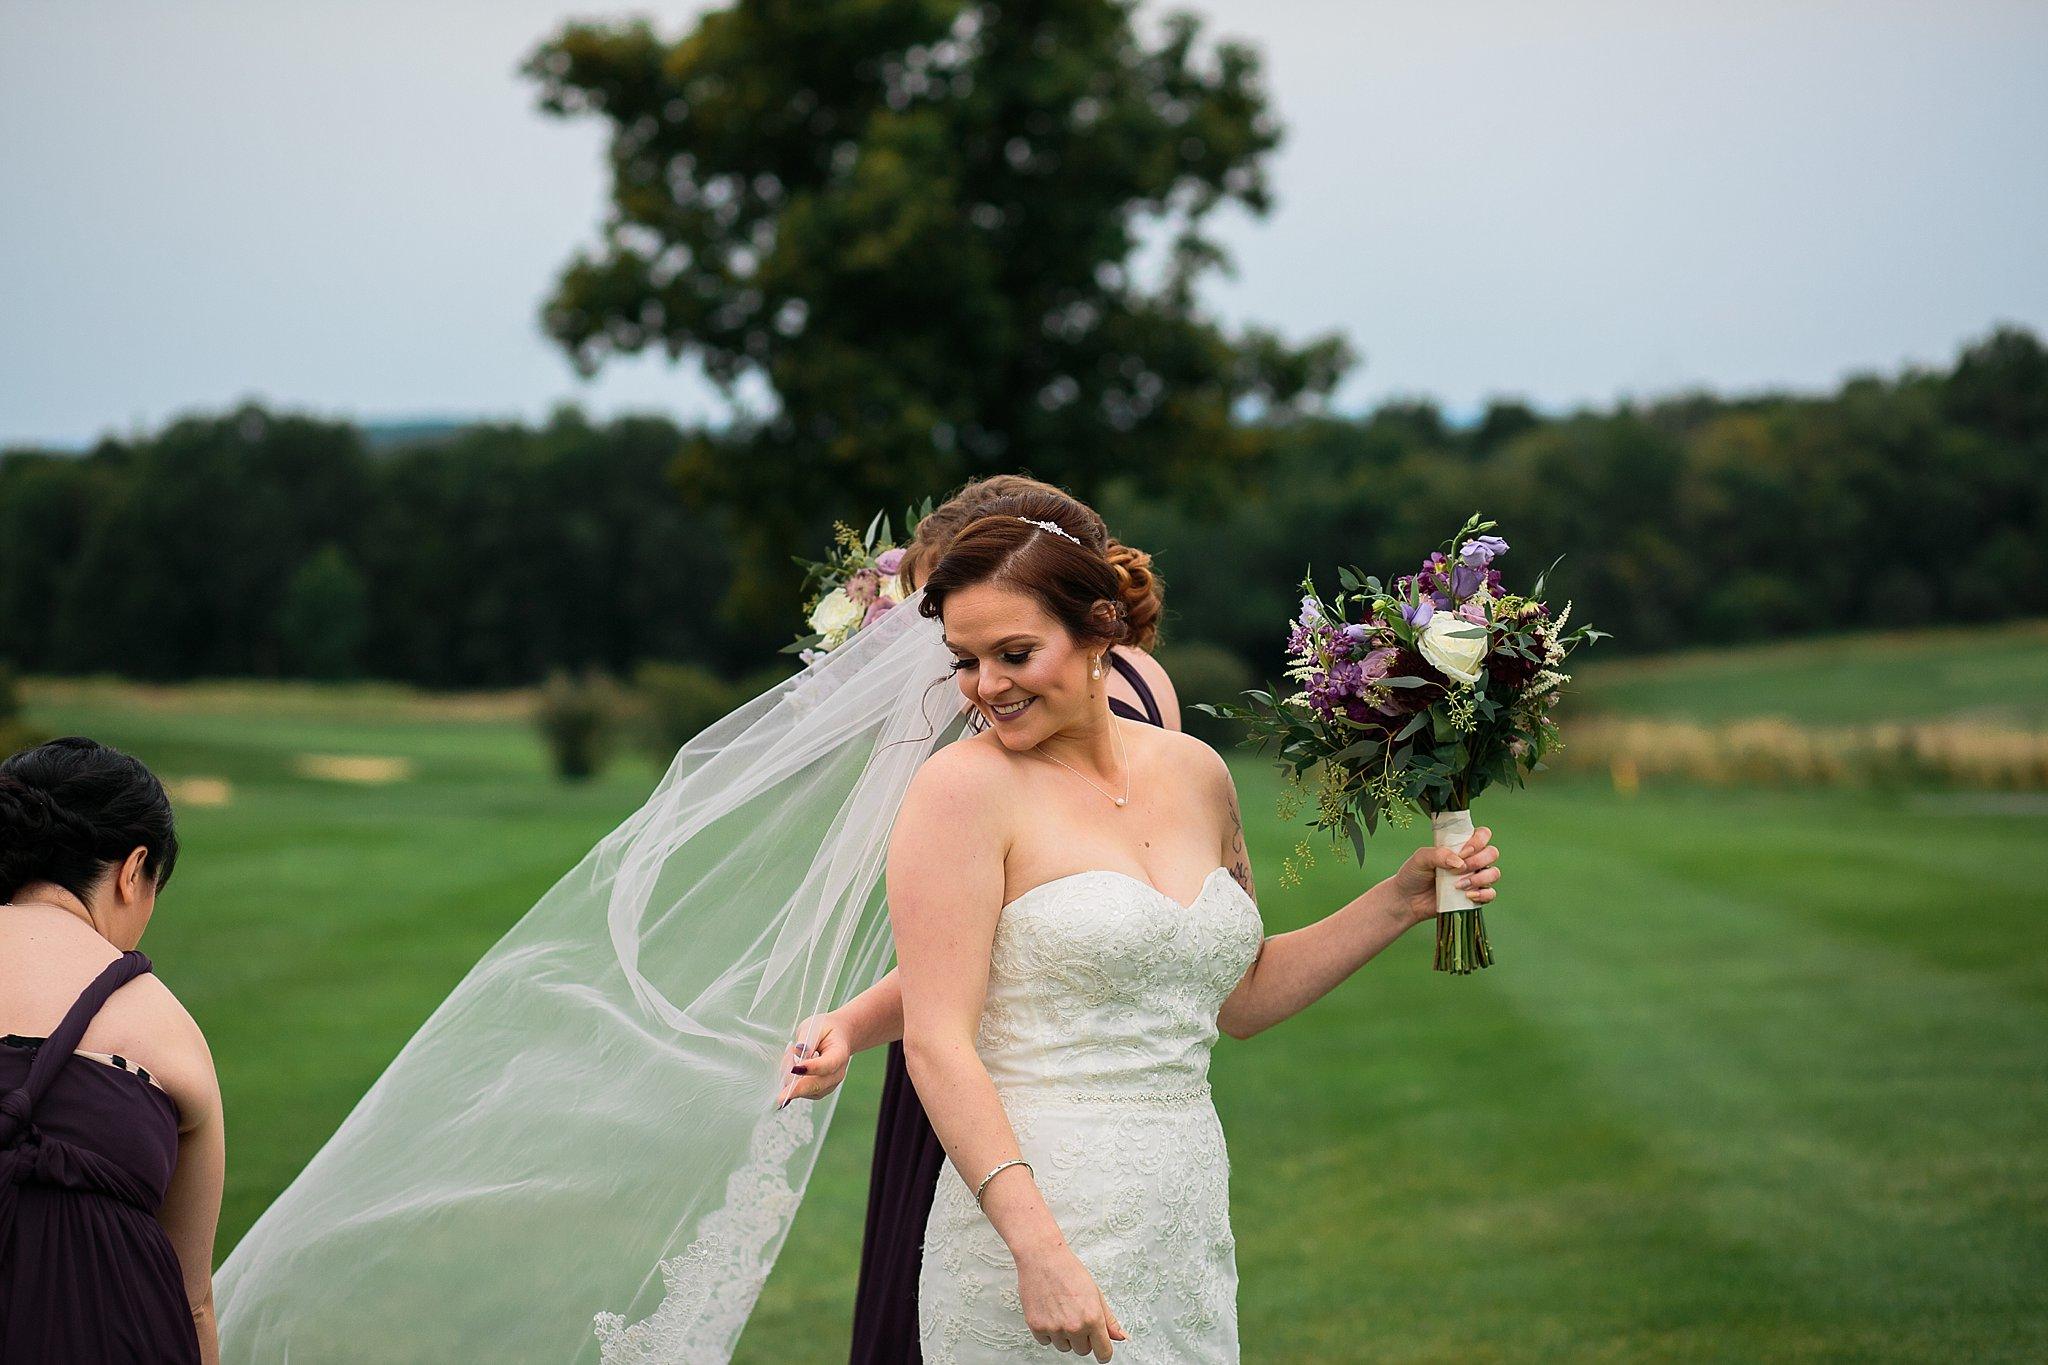 Links at Unionvale Wedding Lagrangeville Wedding Hudson Valley Wedding Photographer Sweet Alice Photography40.jpg